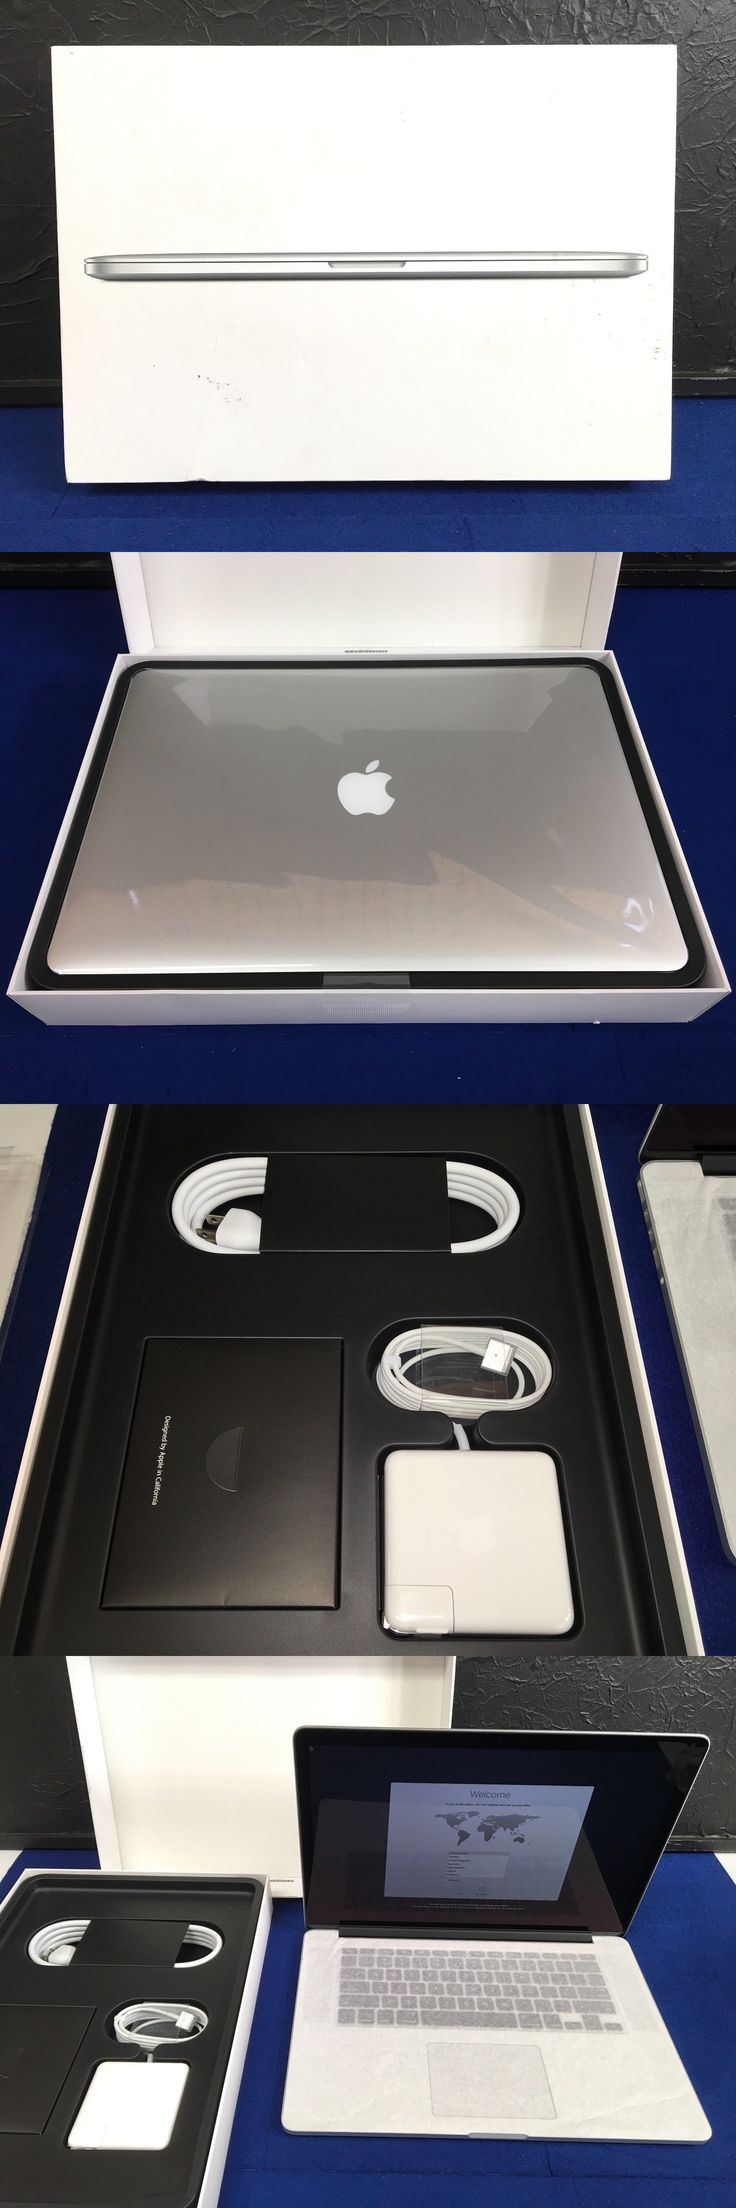 general for sale: Apple Macbook Pro Mid 2015 15 Retina I7-4980Hq 2.80Ghz 16Gb 512Gb Z0rf0004a New -> BUY IT NOW ONLY: $1859.99 on eBay!